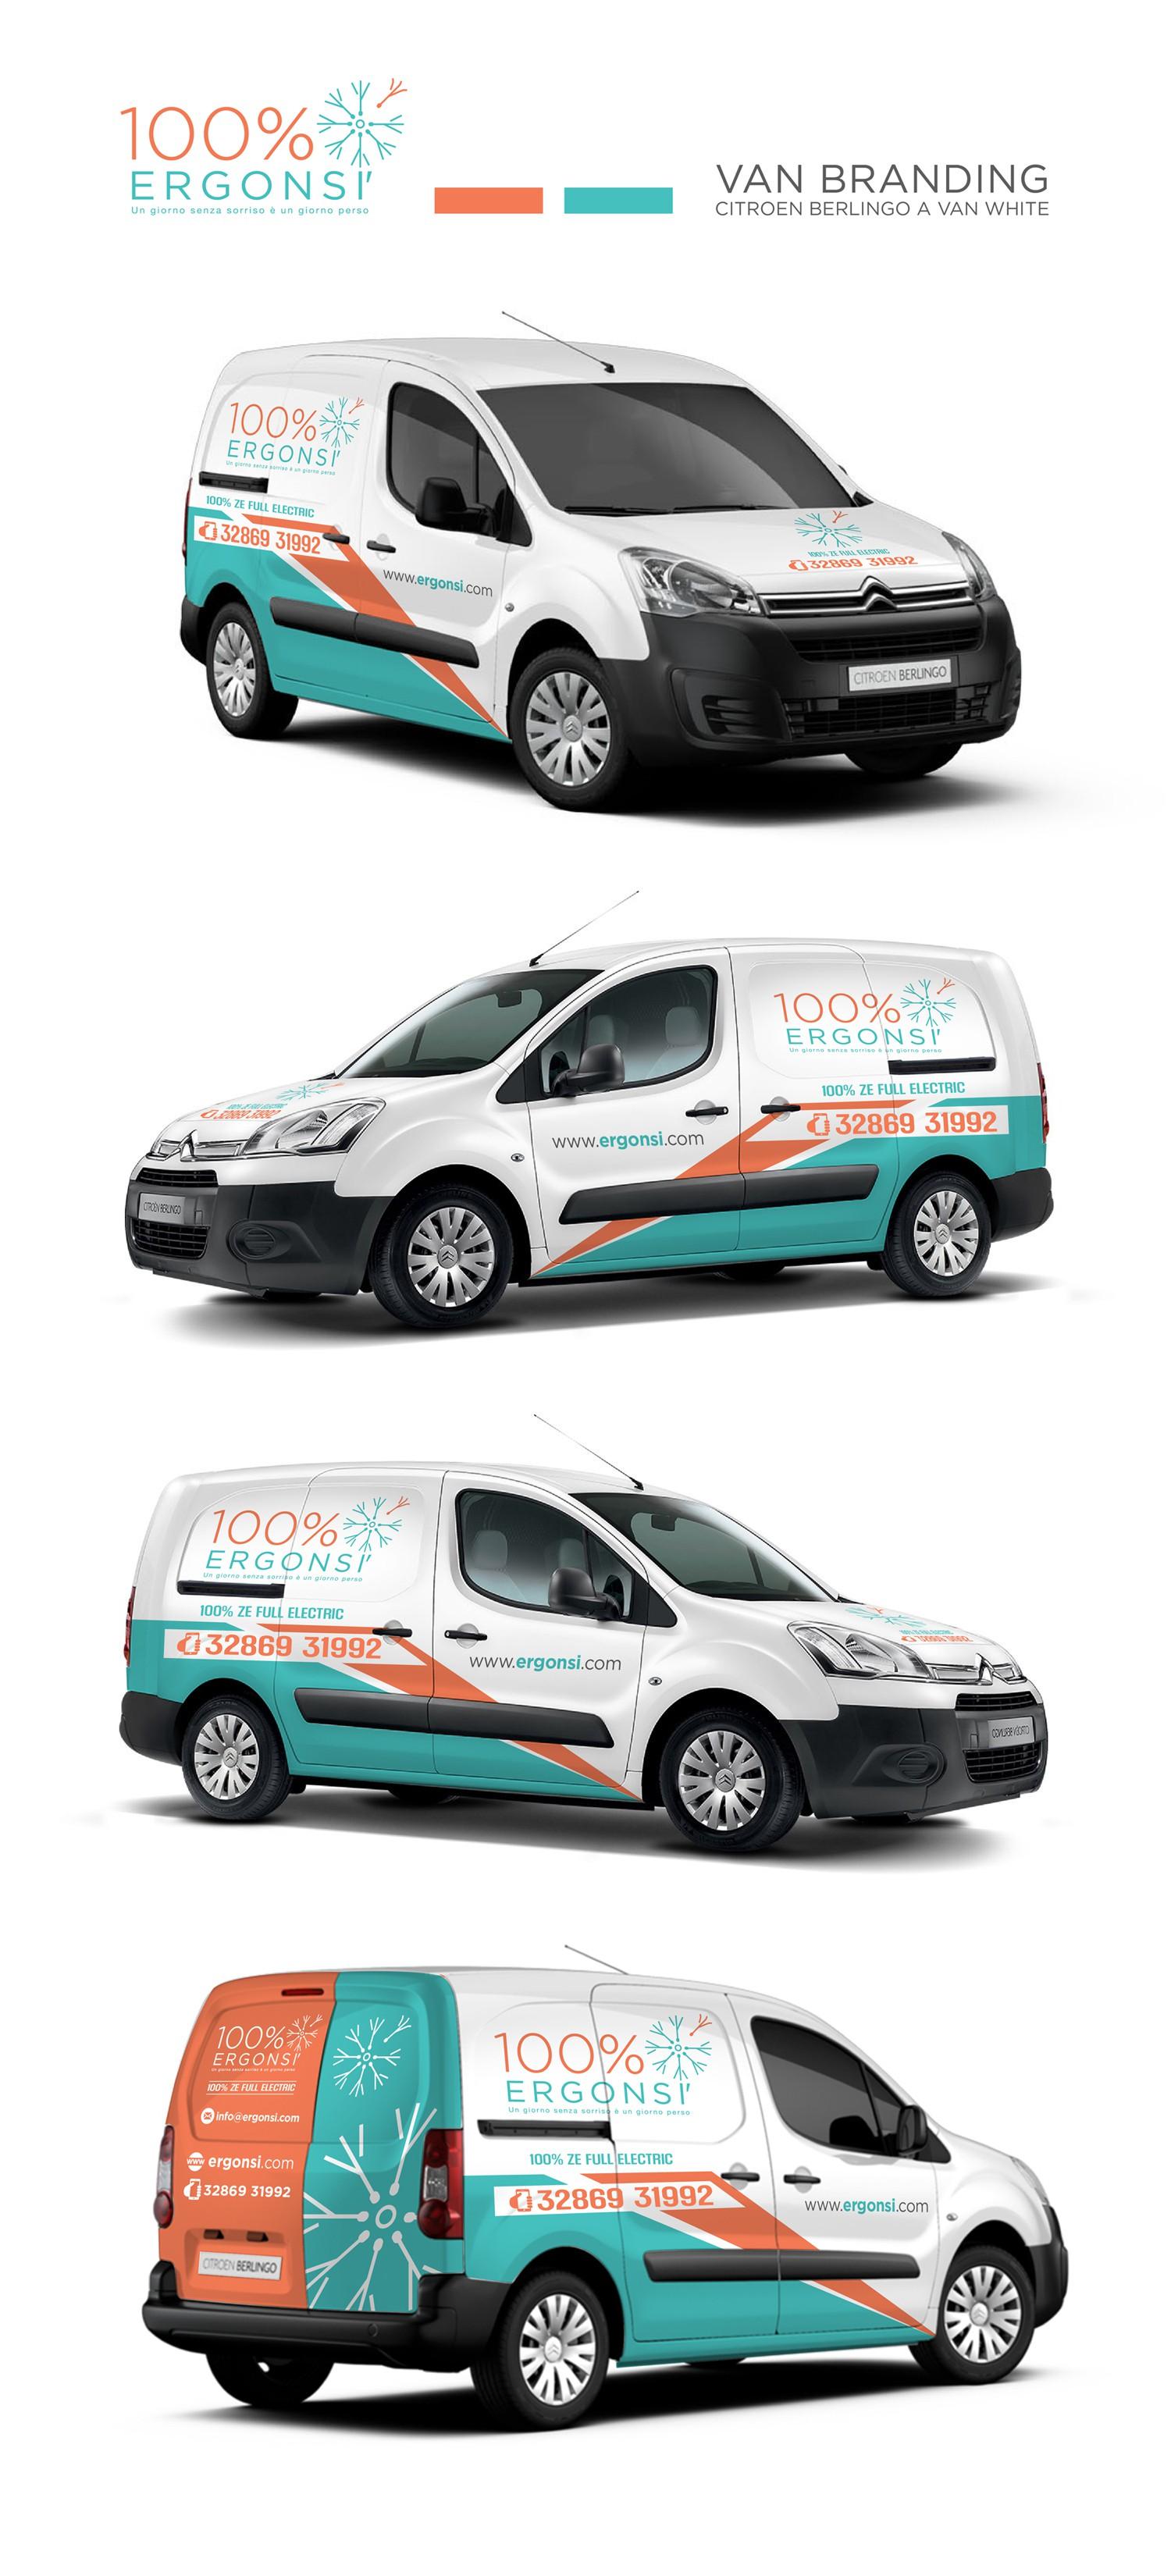 ERGONSI' Van branding